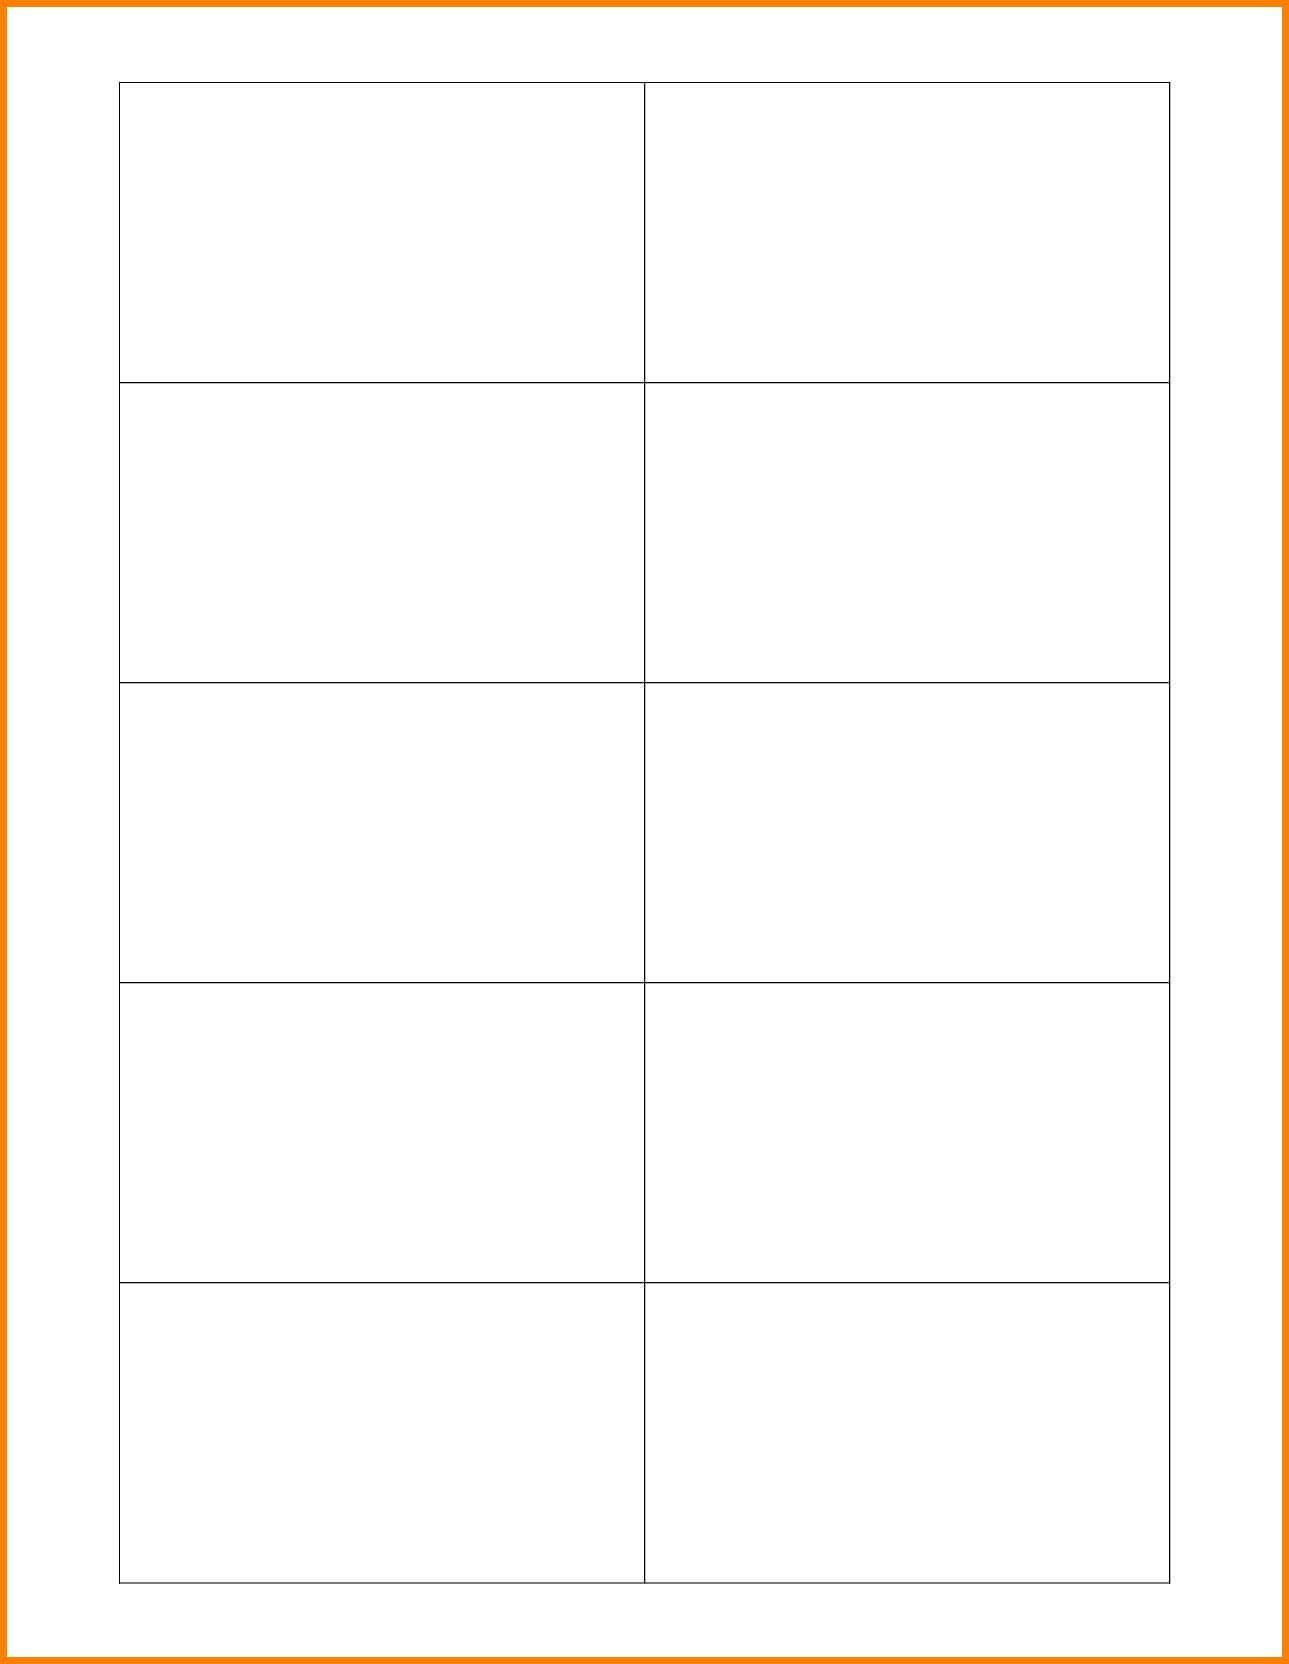 001 Blank Business Card Template Free Microsoft Word Intended For Blank Business Card Template Microsoft Word